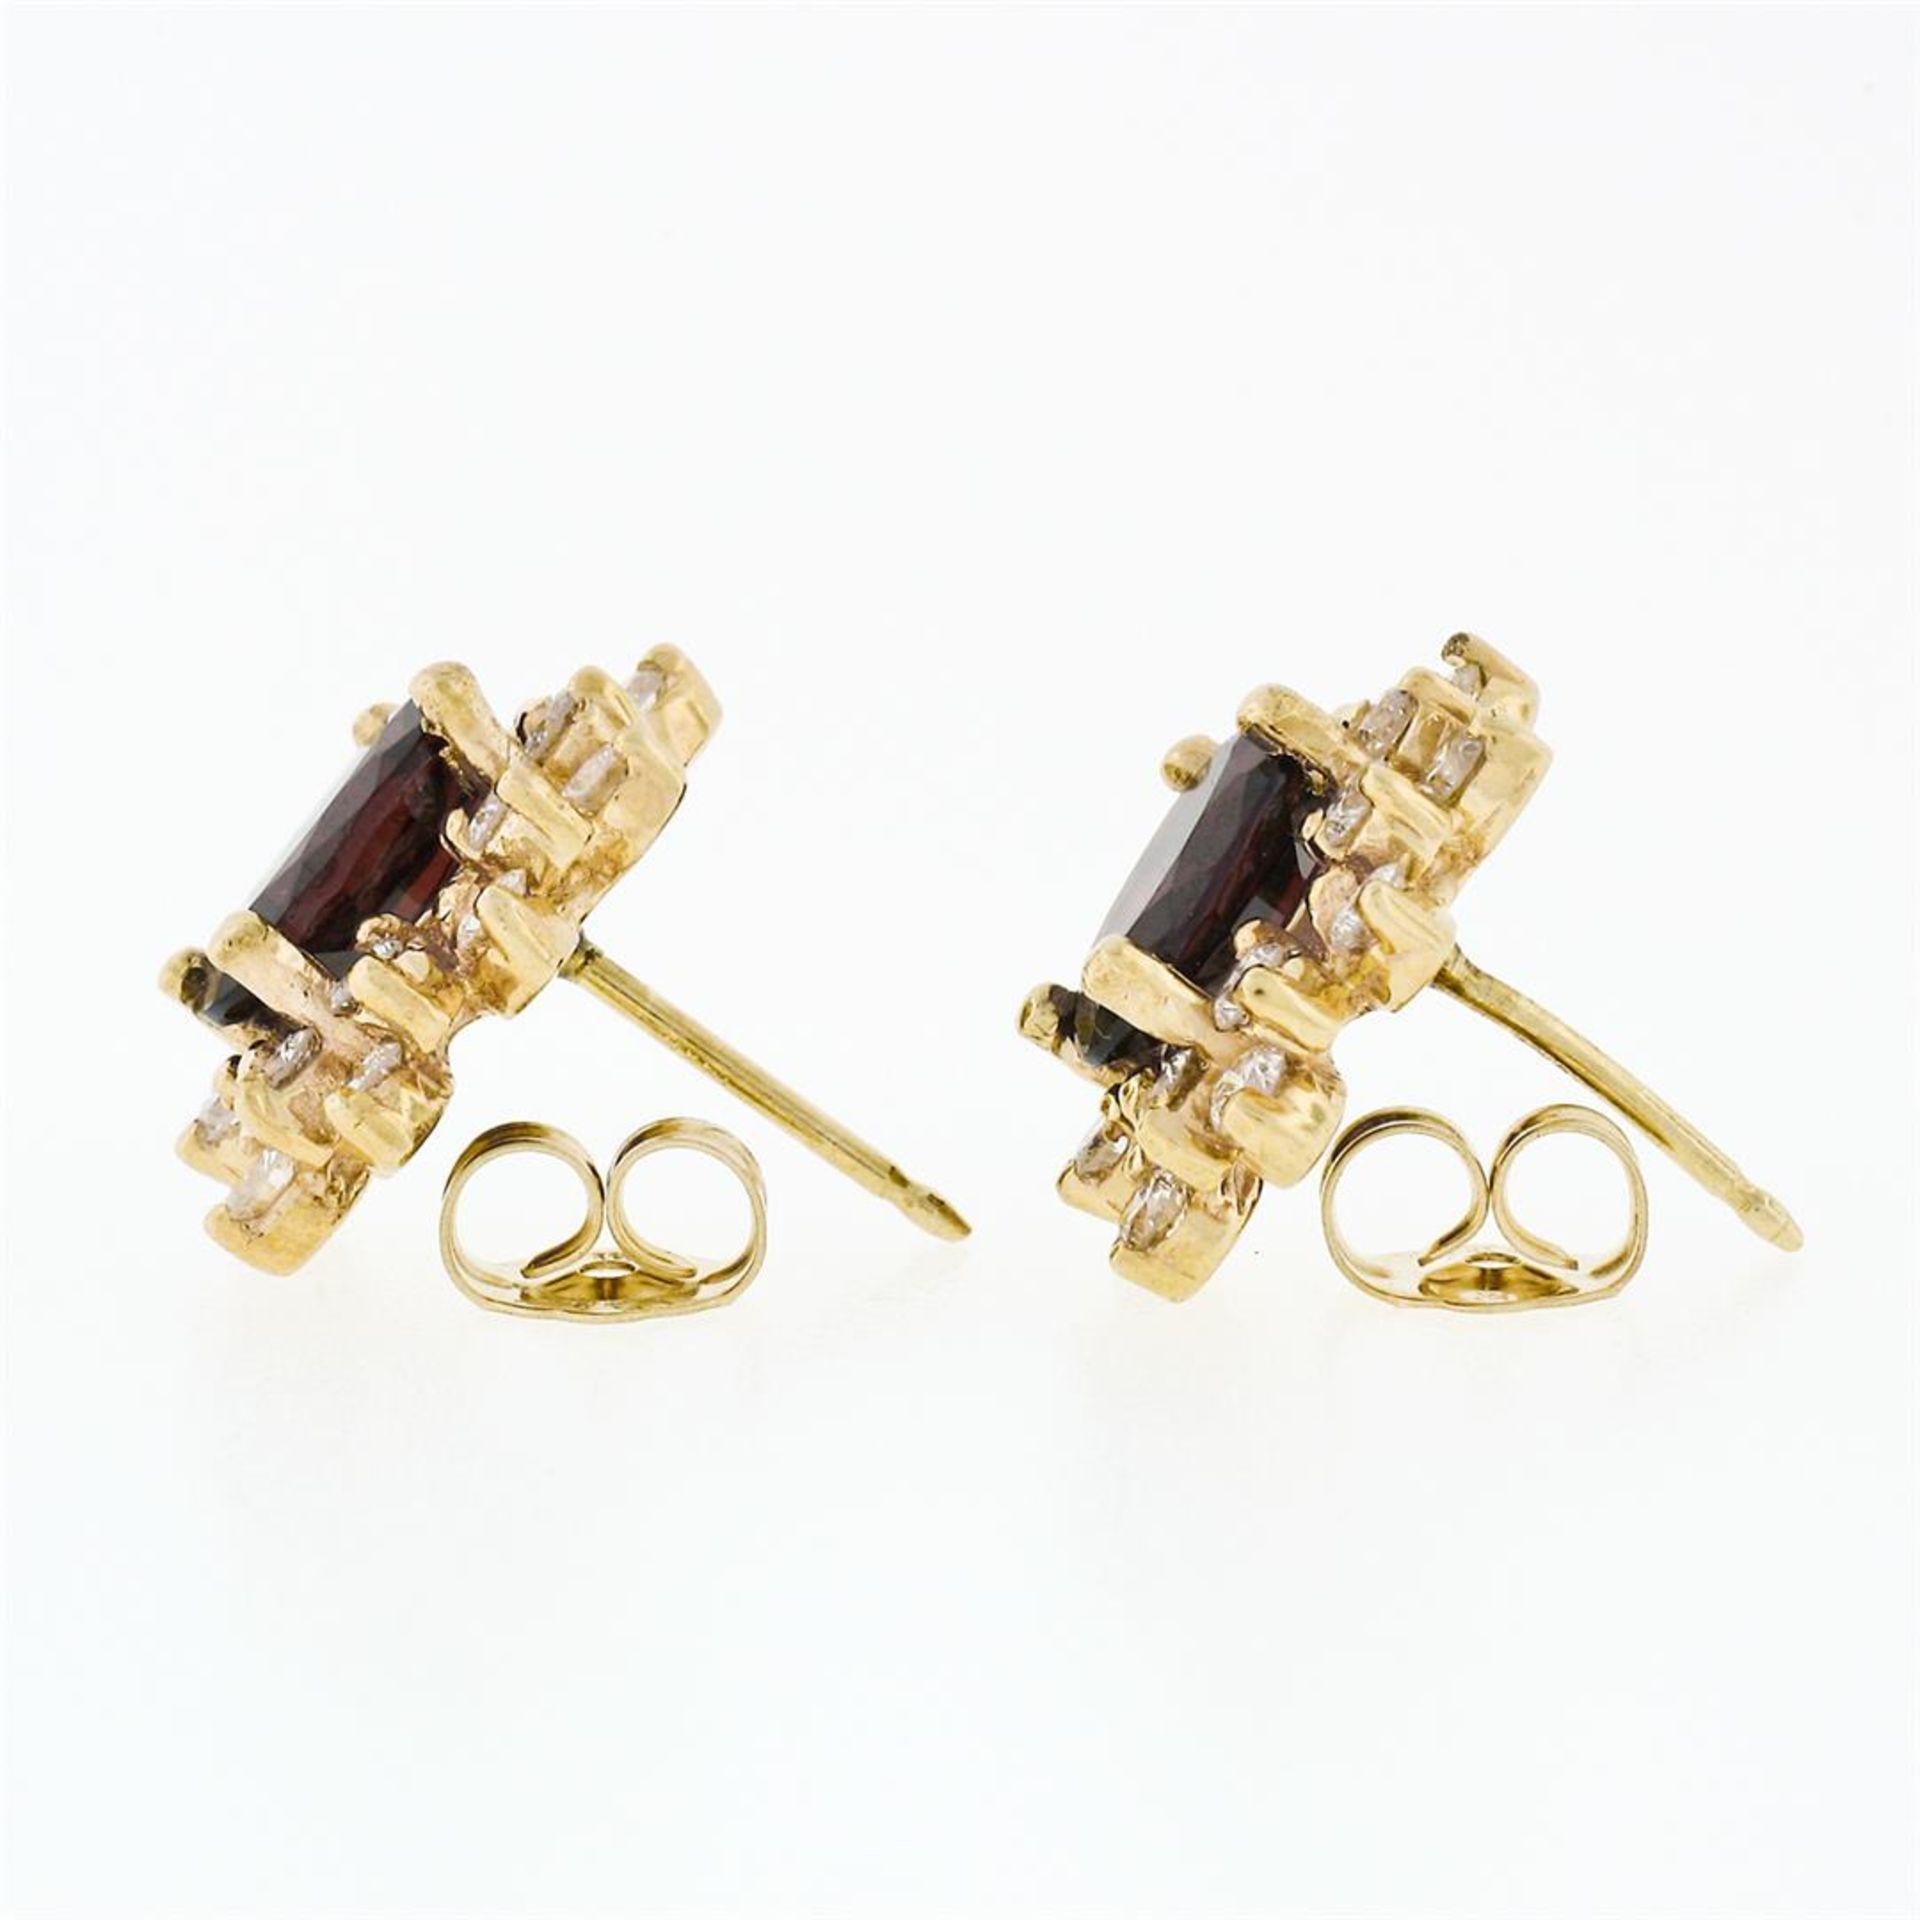 14k Yellow Gold 3.80ctw Oval Garnet & Layered Round Diamond Halo Stud Earrings - Image 3 of 5